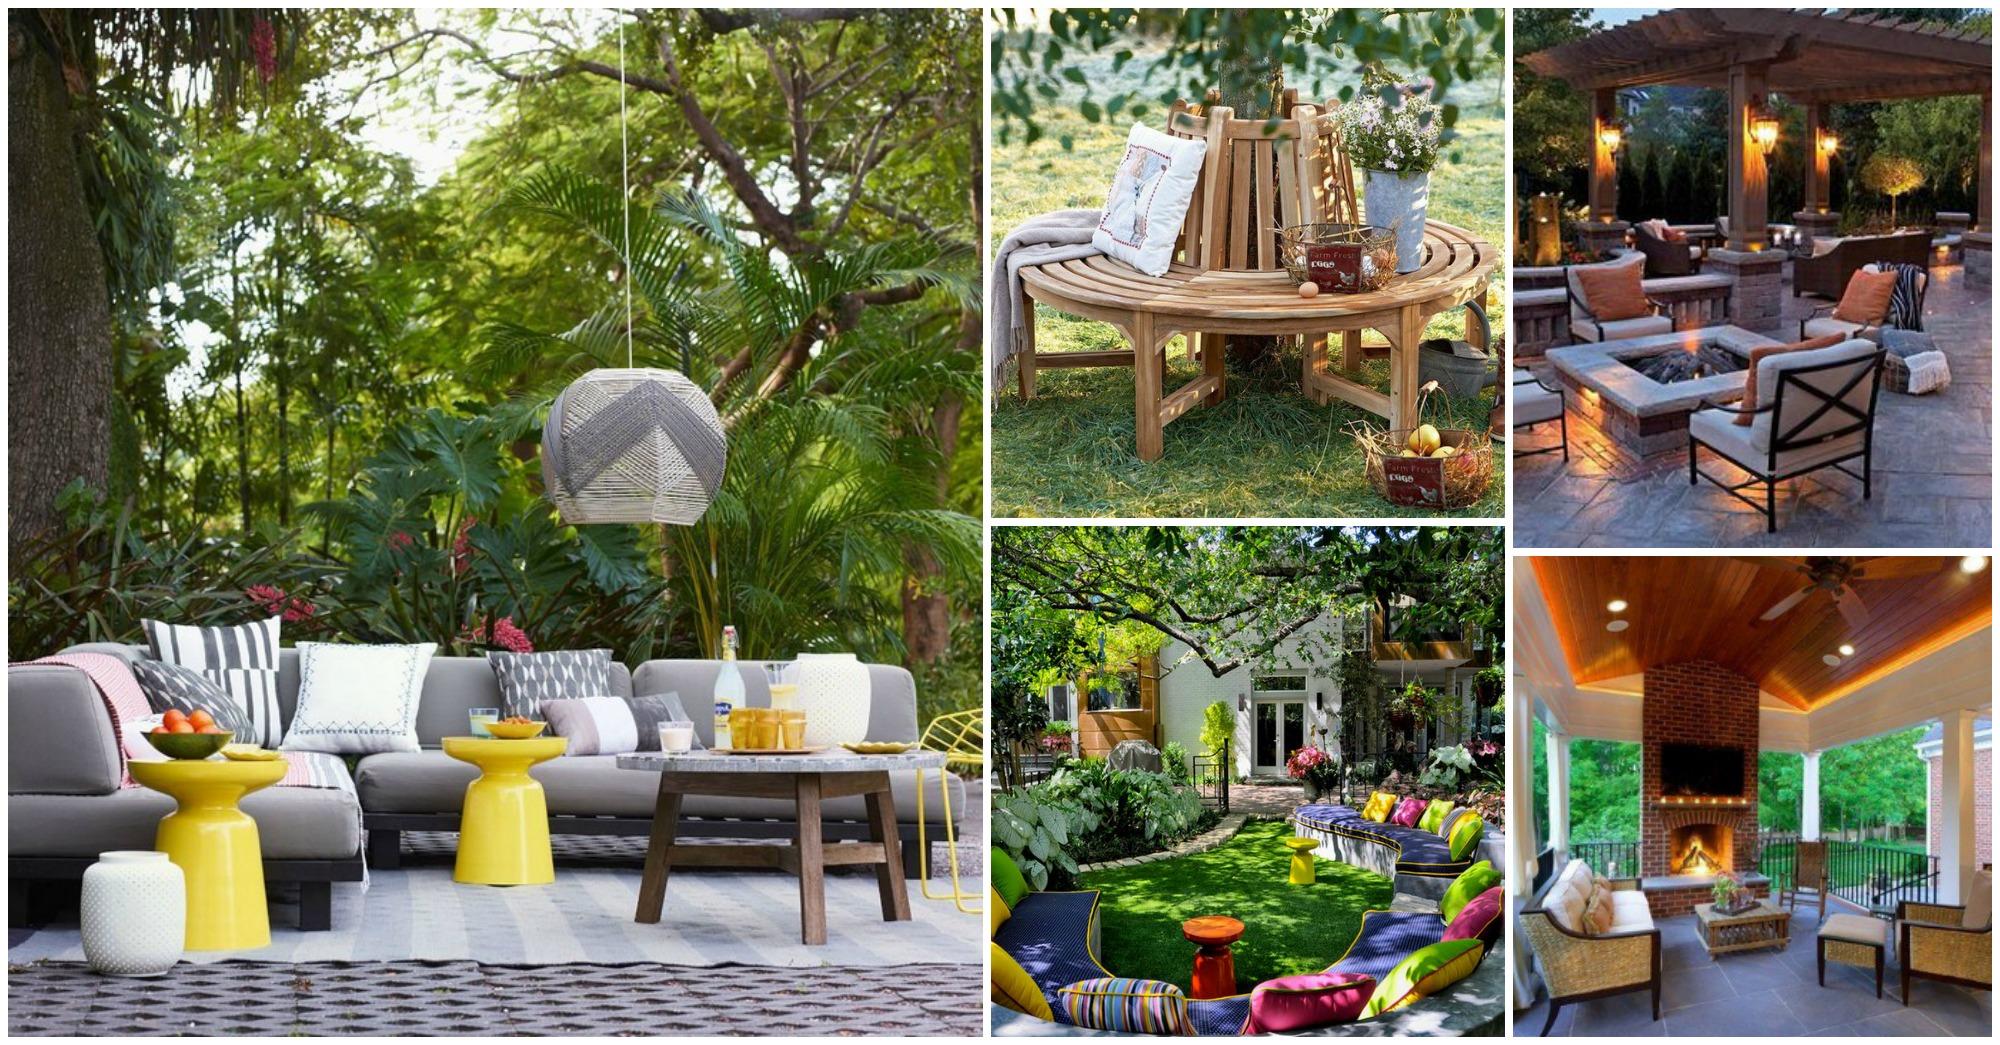 Fullsize Of Backyard Decor Ideas